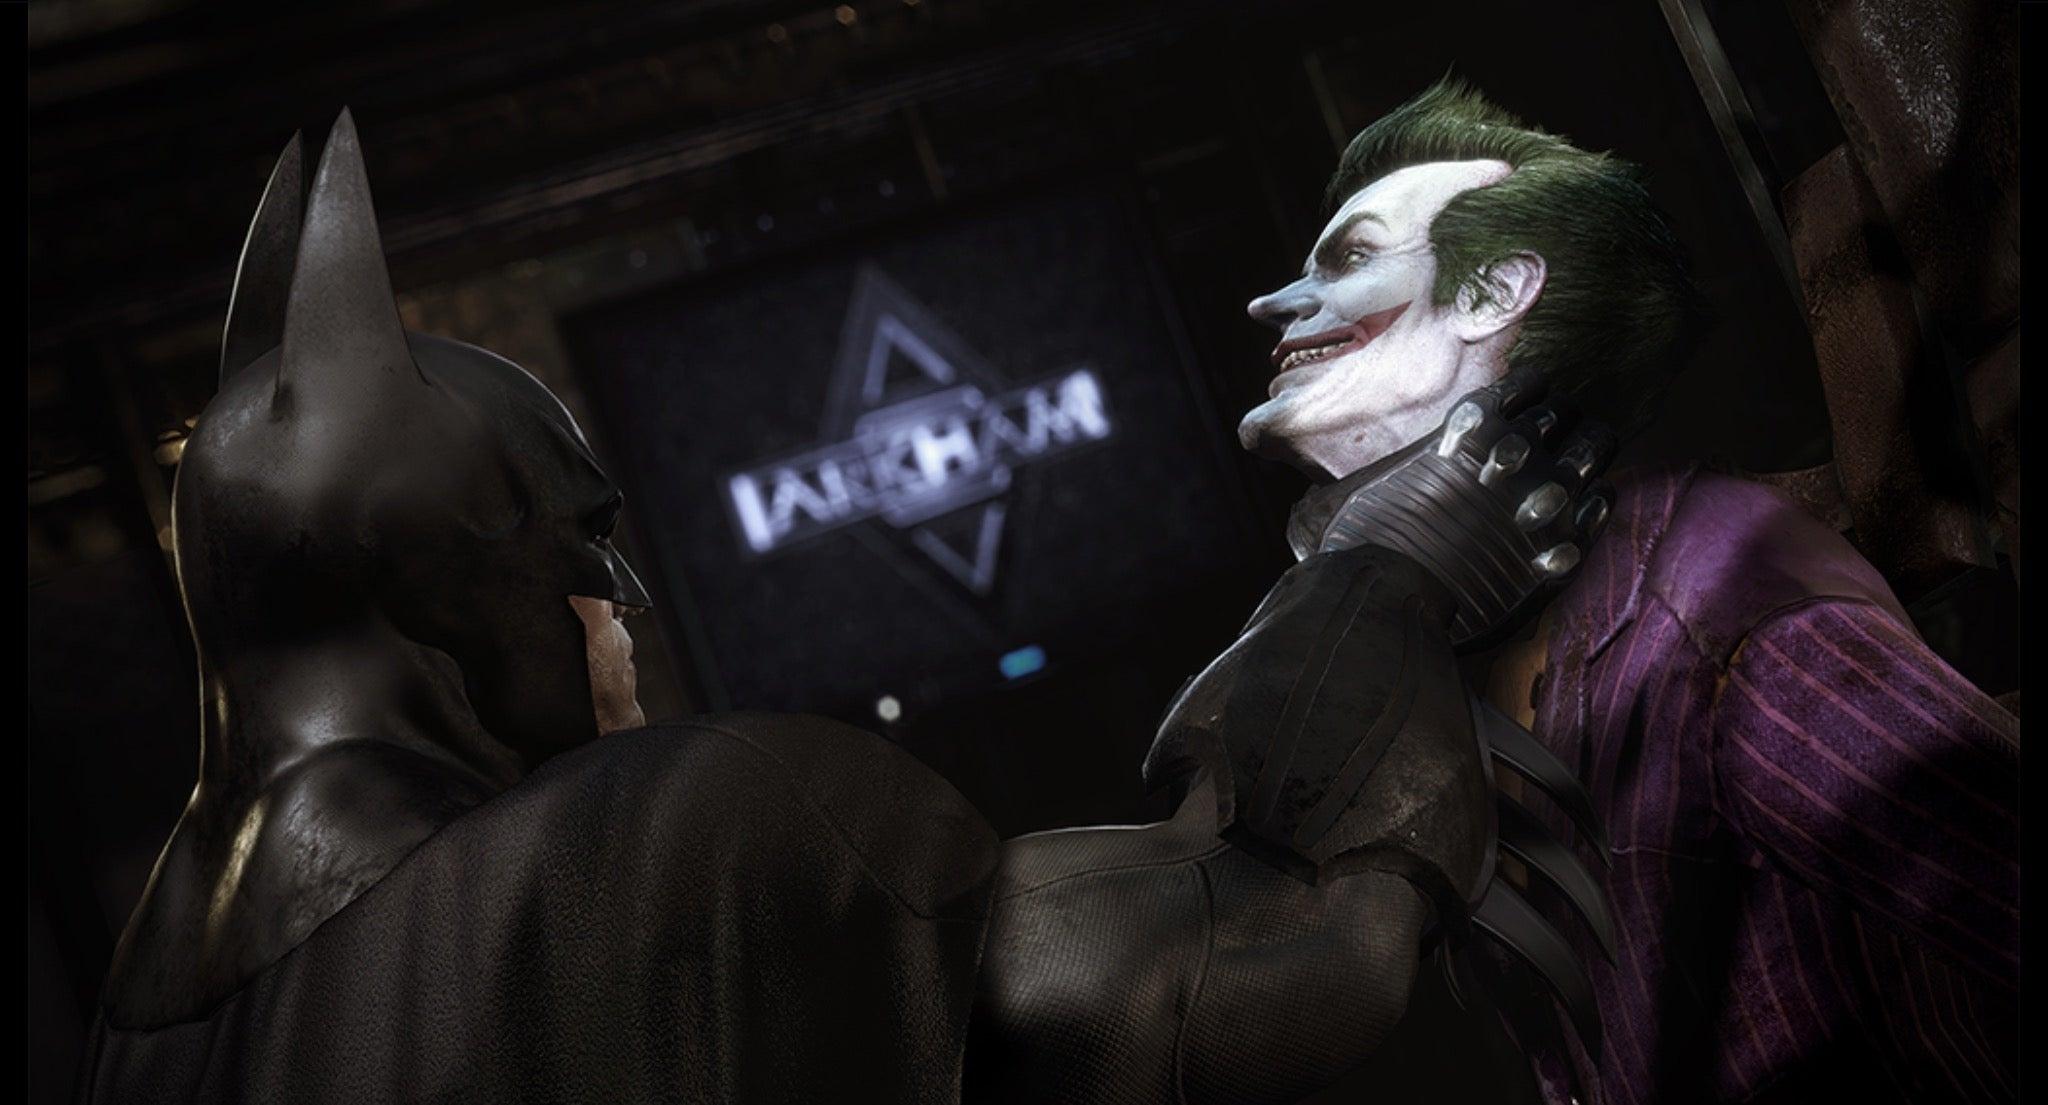 Image for Batman: Return to Arkham comparison shots reveal better textures, lighting